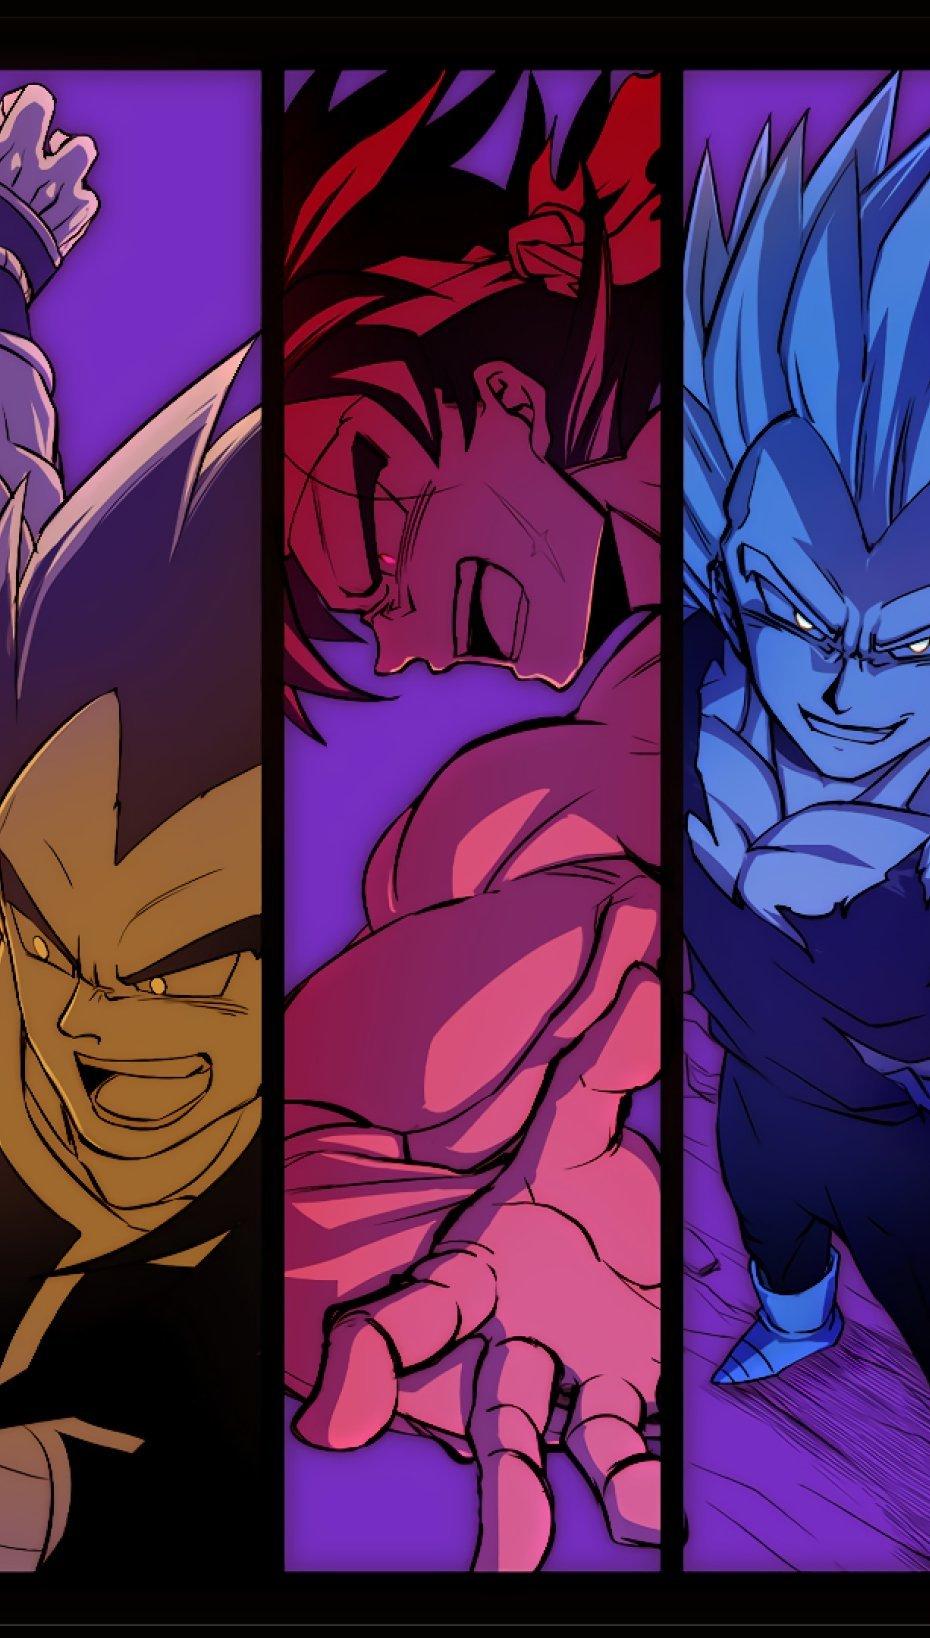 Anime Wallpaper Dragon Ball Characters Vertical